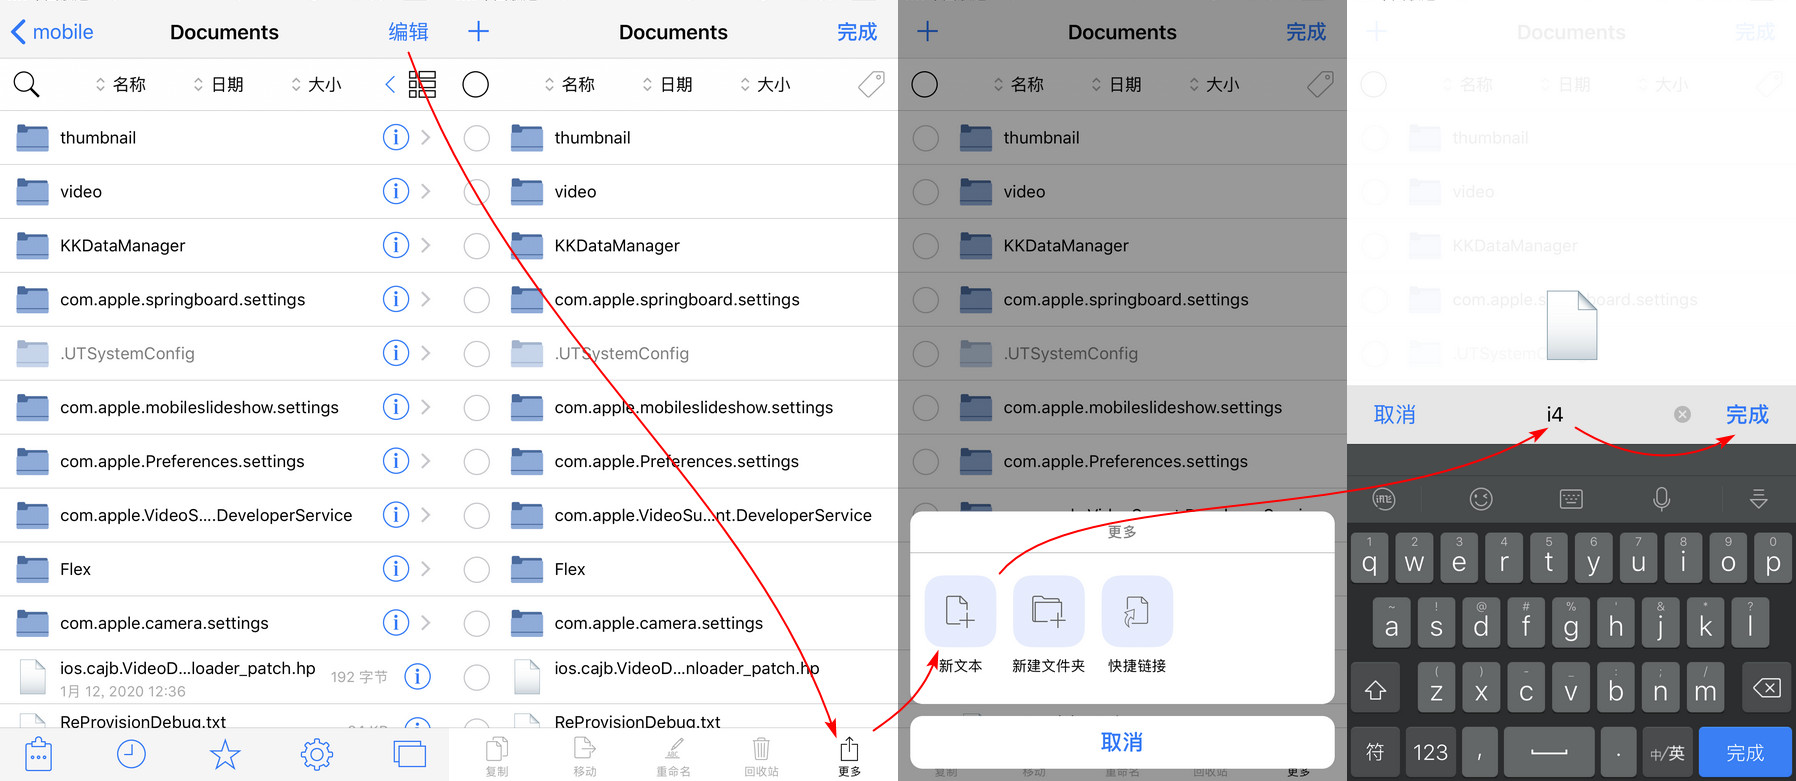 iOS 13.3 越狱后无法接收短信如何解决?